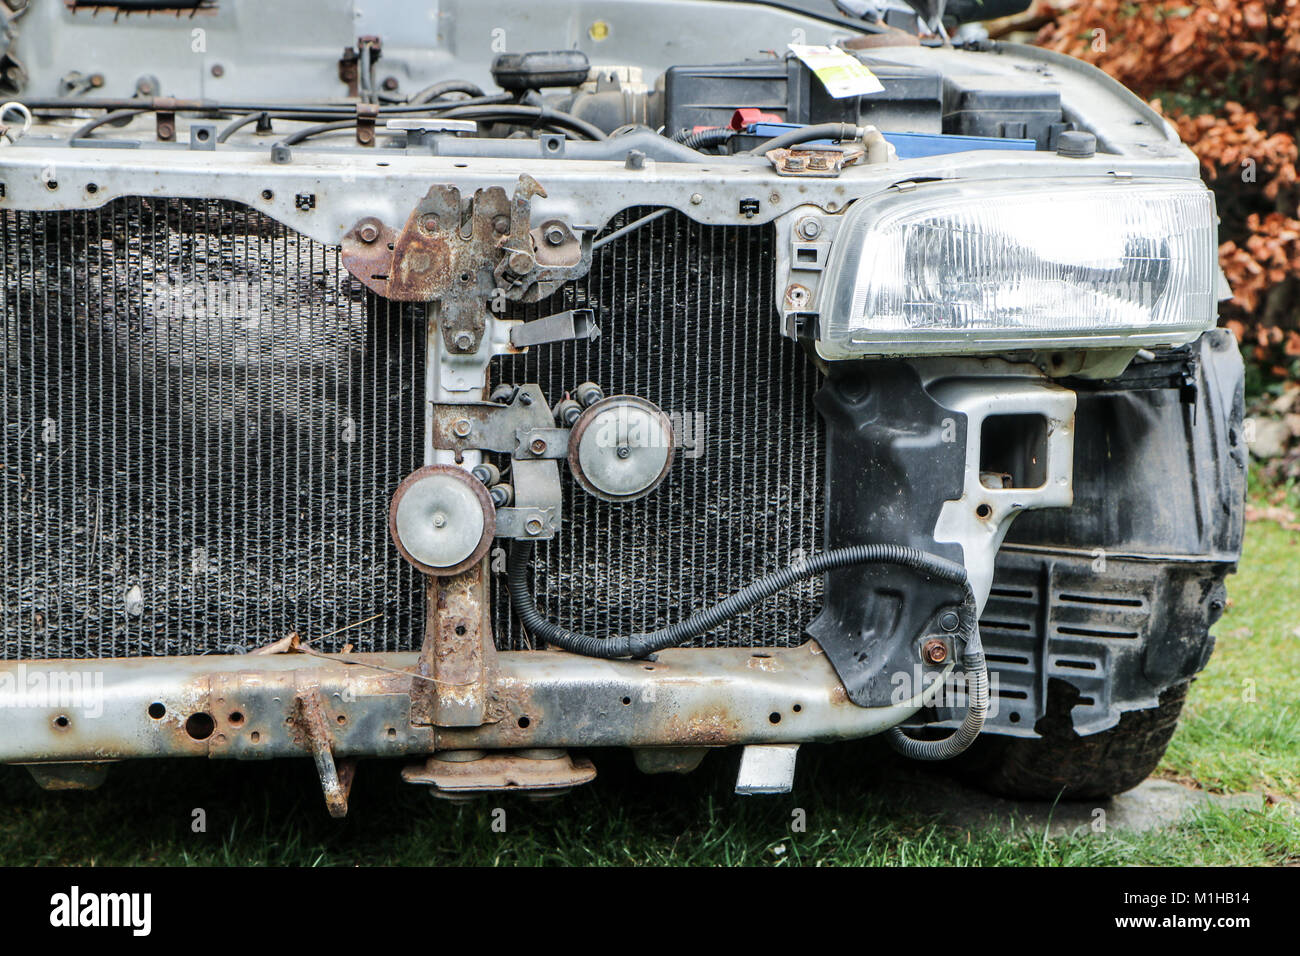 Car Without Engine Stockfotos & Car Without Engine Bilder - Alamy